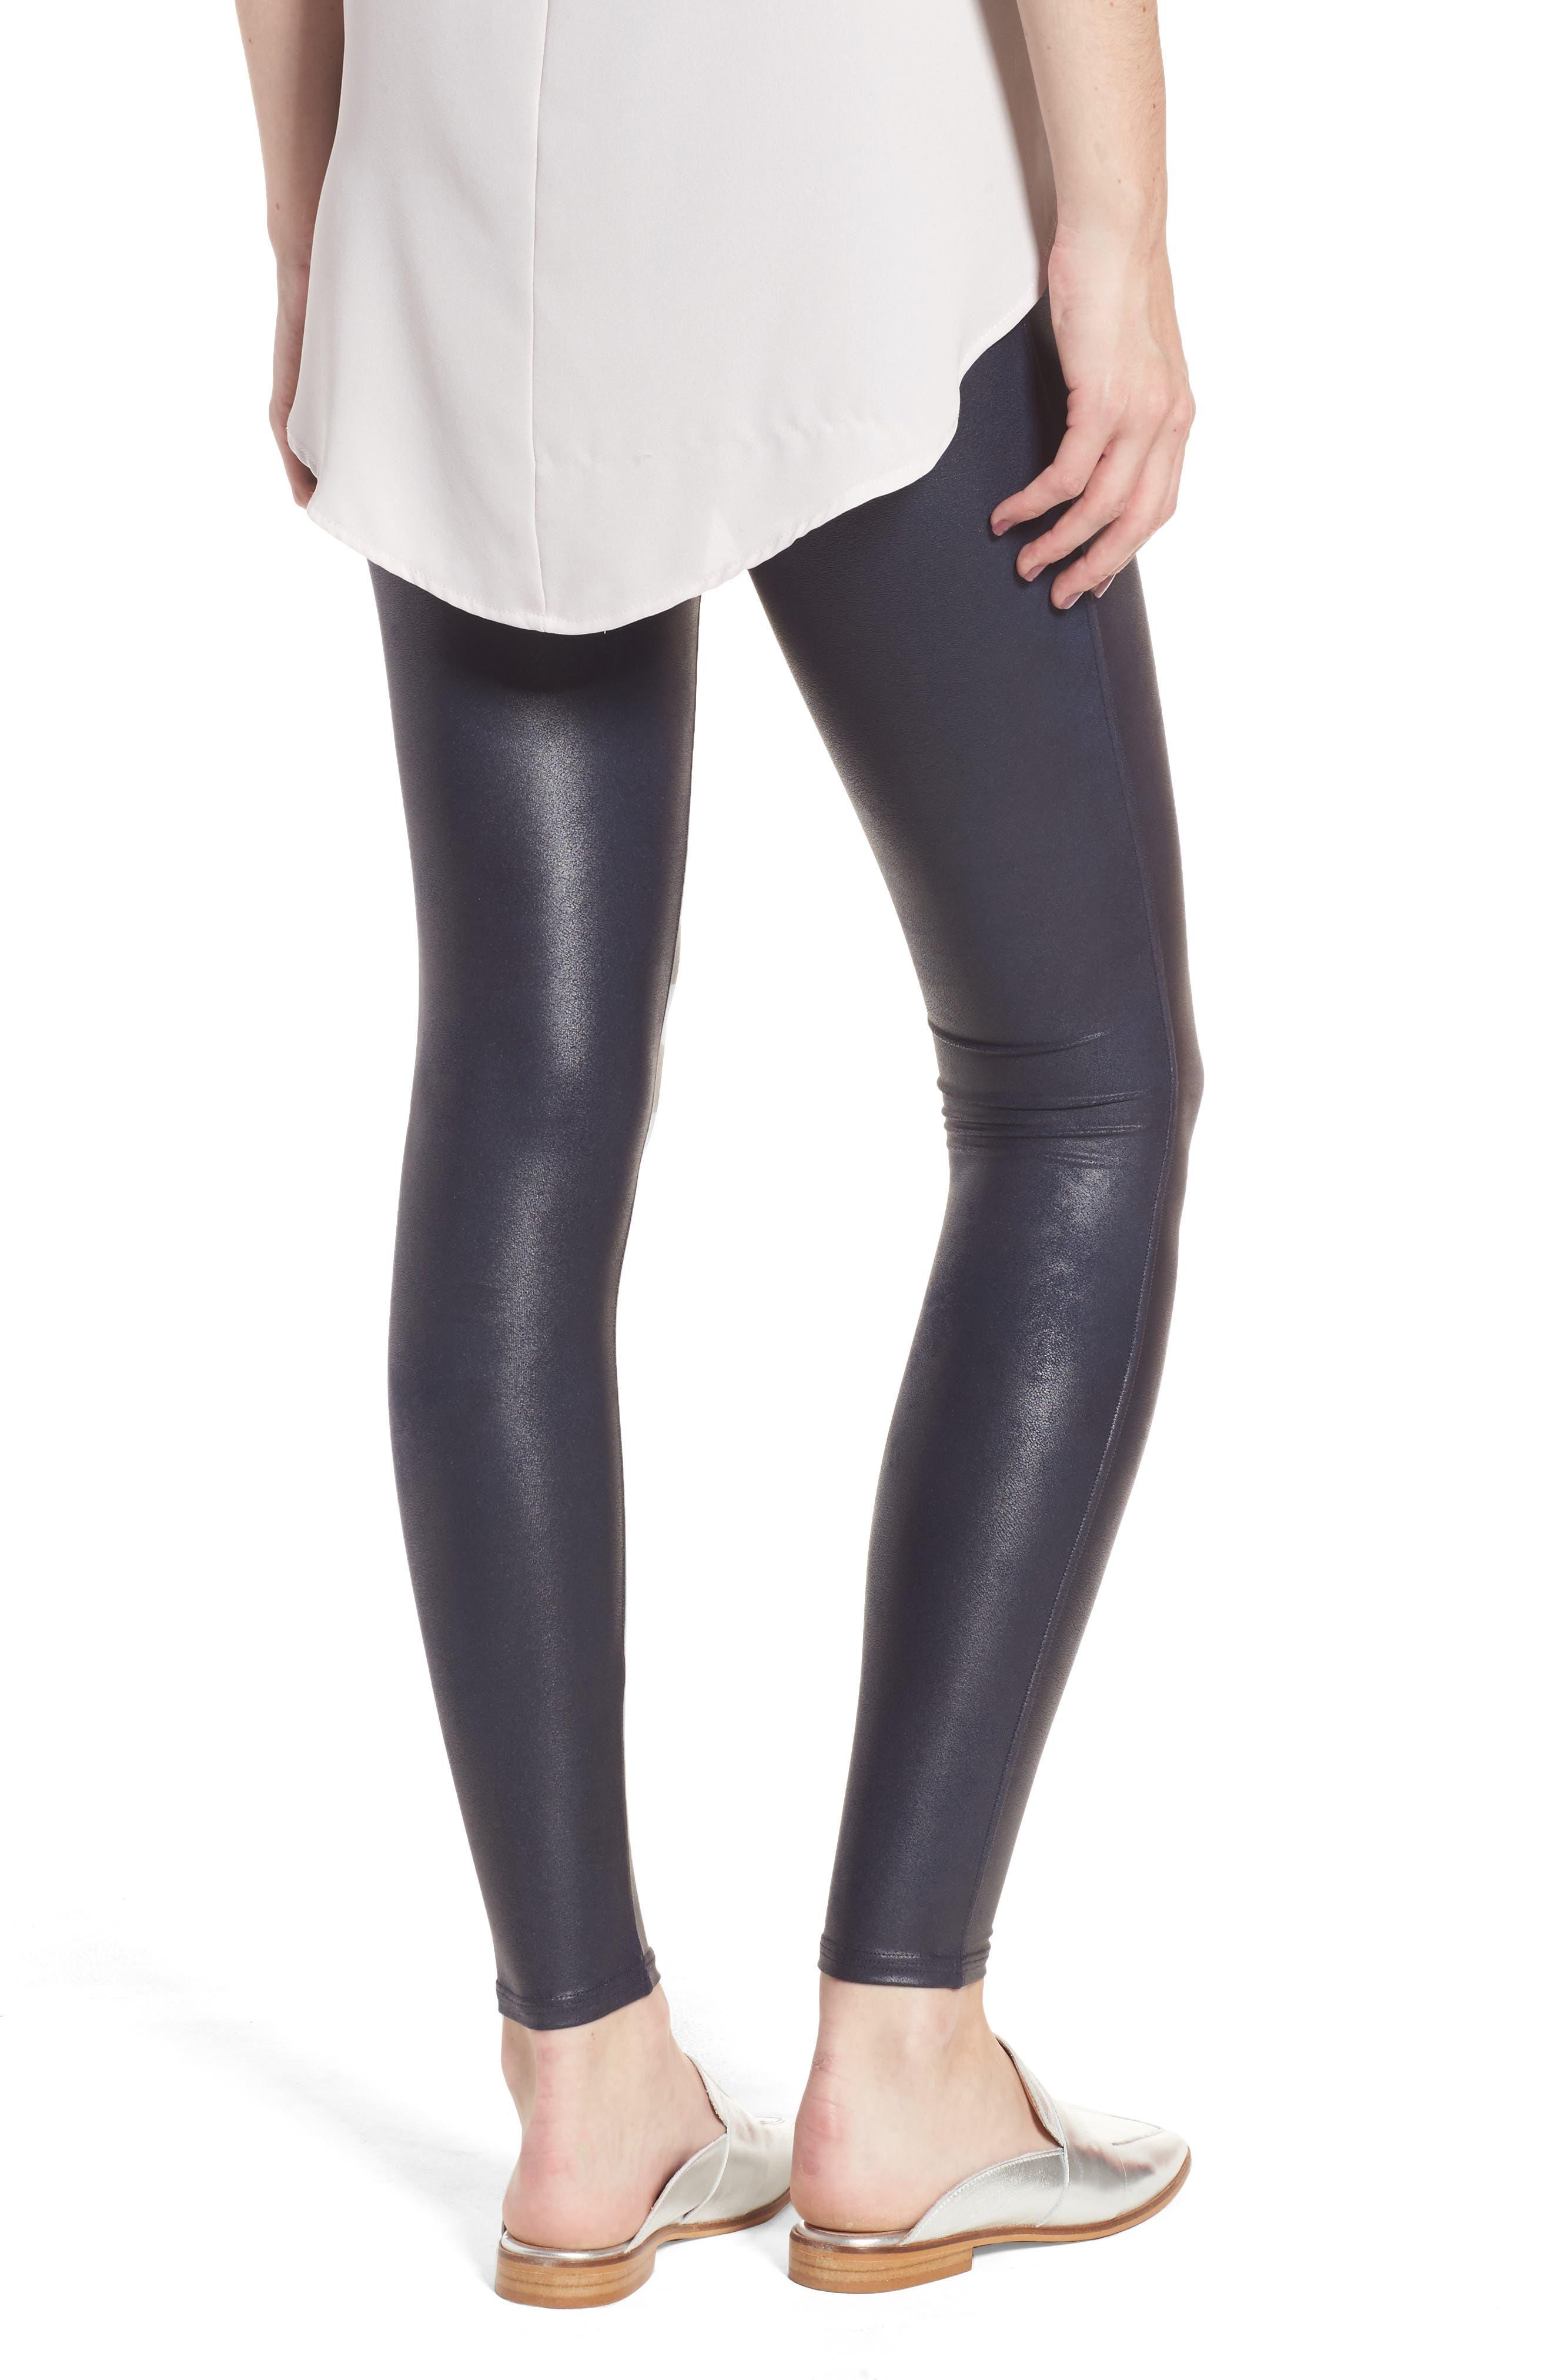 Luna Legging in Gray Stone Fox Swim Pre Order Online oOW2C